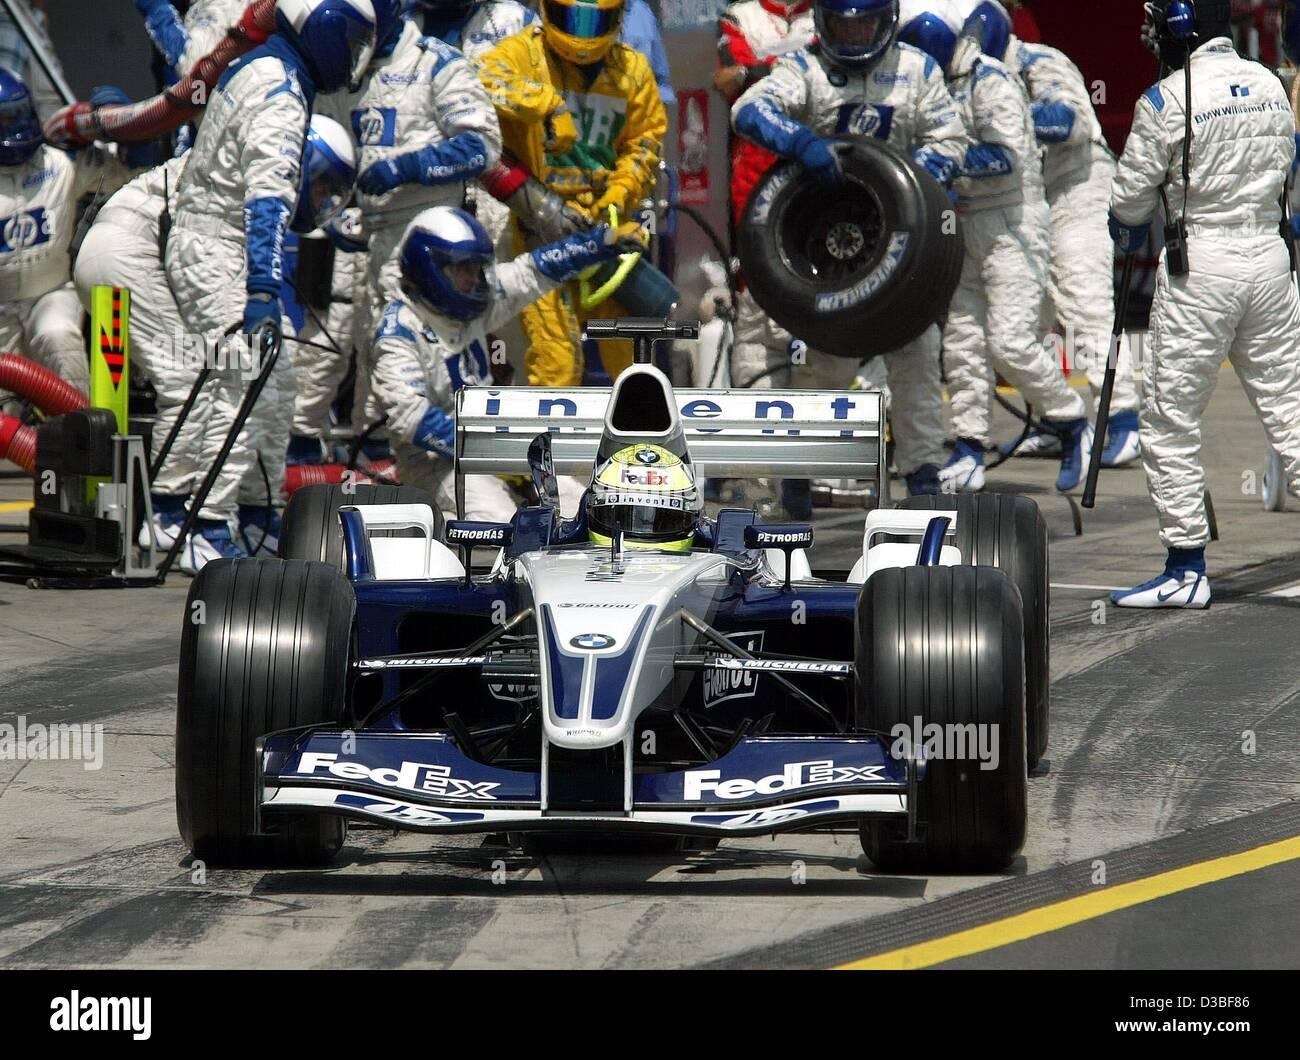 2003 European Grand Prix